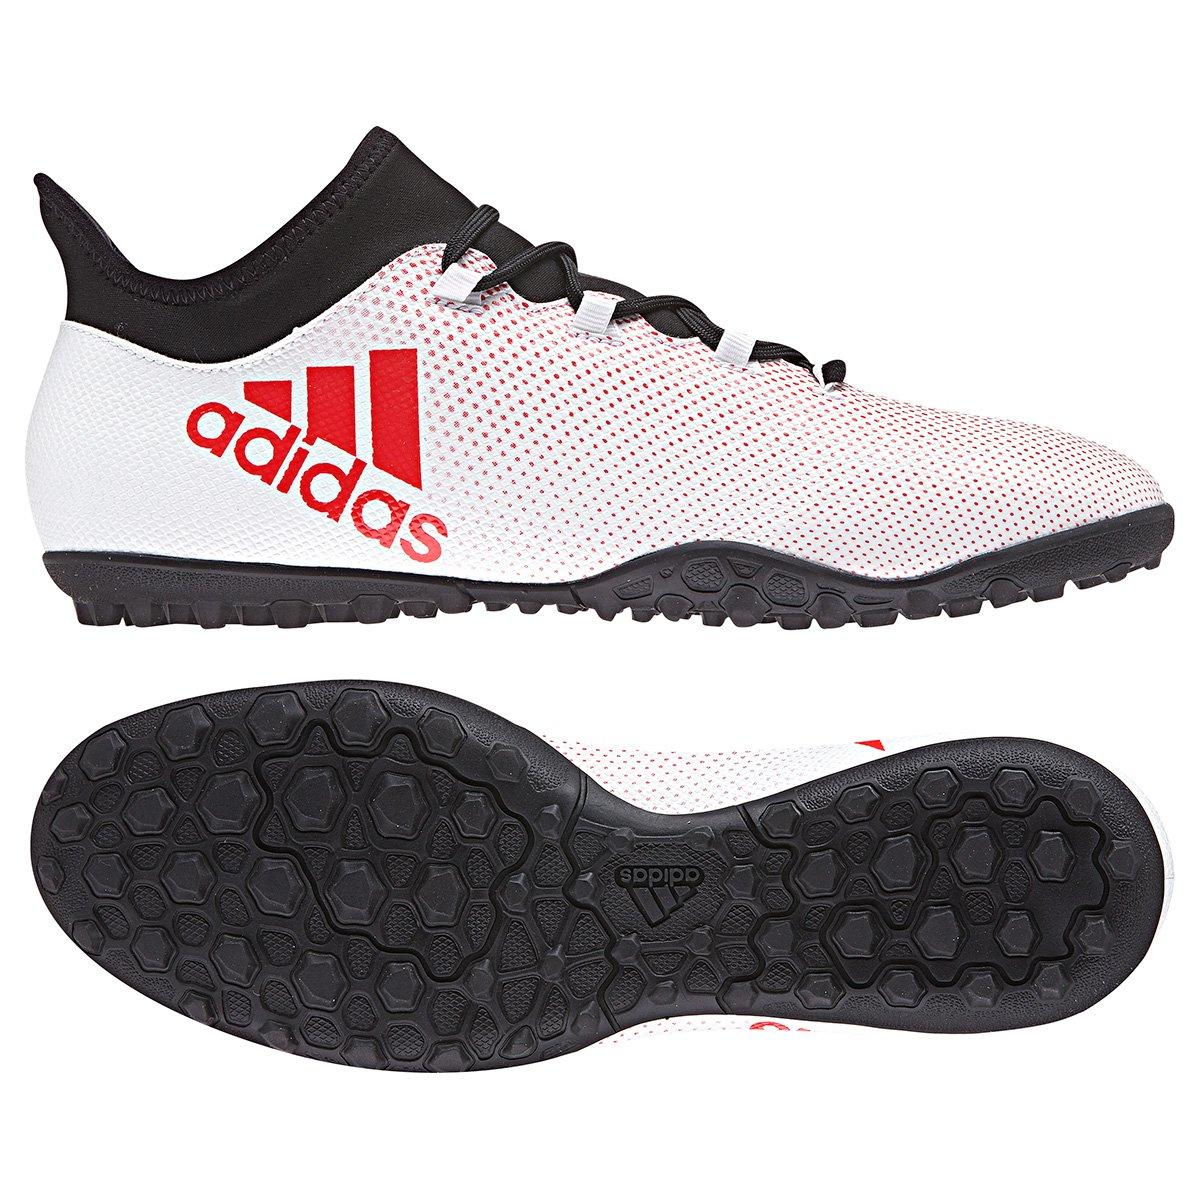 f63b591592 Chuteira Society Adidas X 17.3 TF - Cinza e Preto